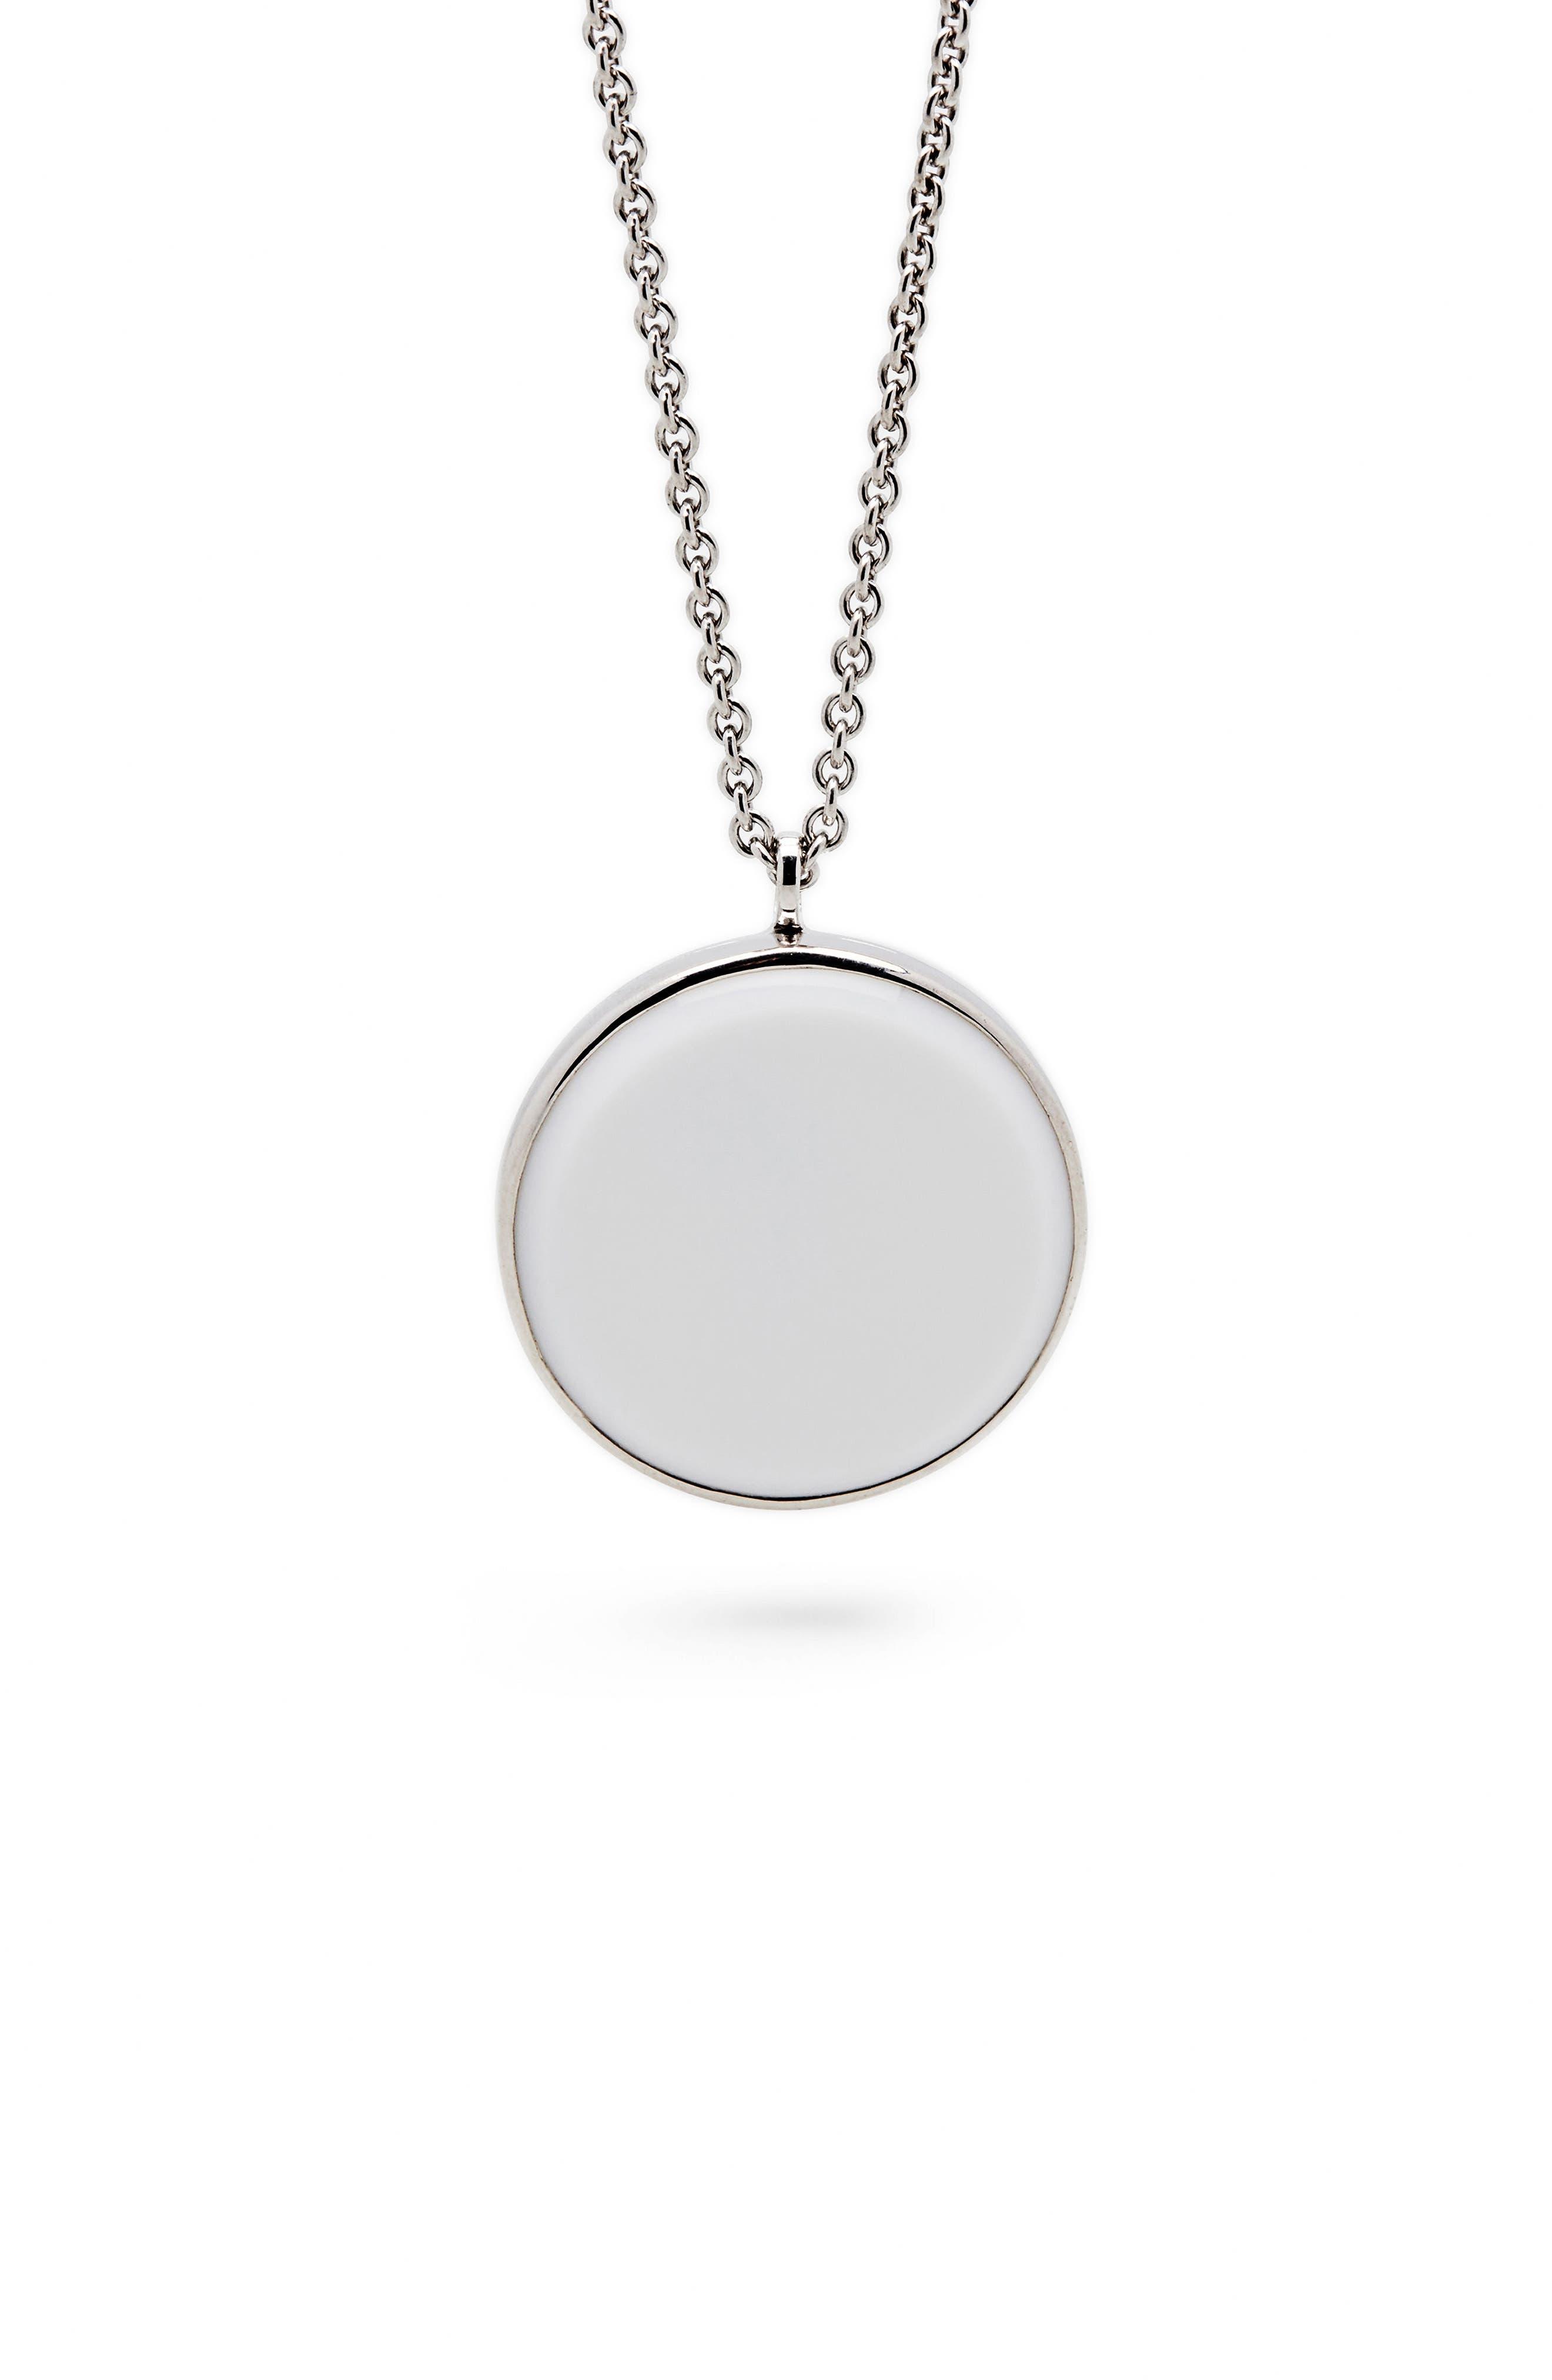 Main Image - Tom Wood White Agate Medallion Necklace